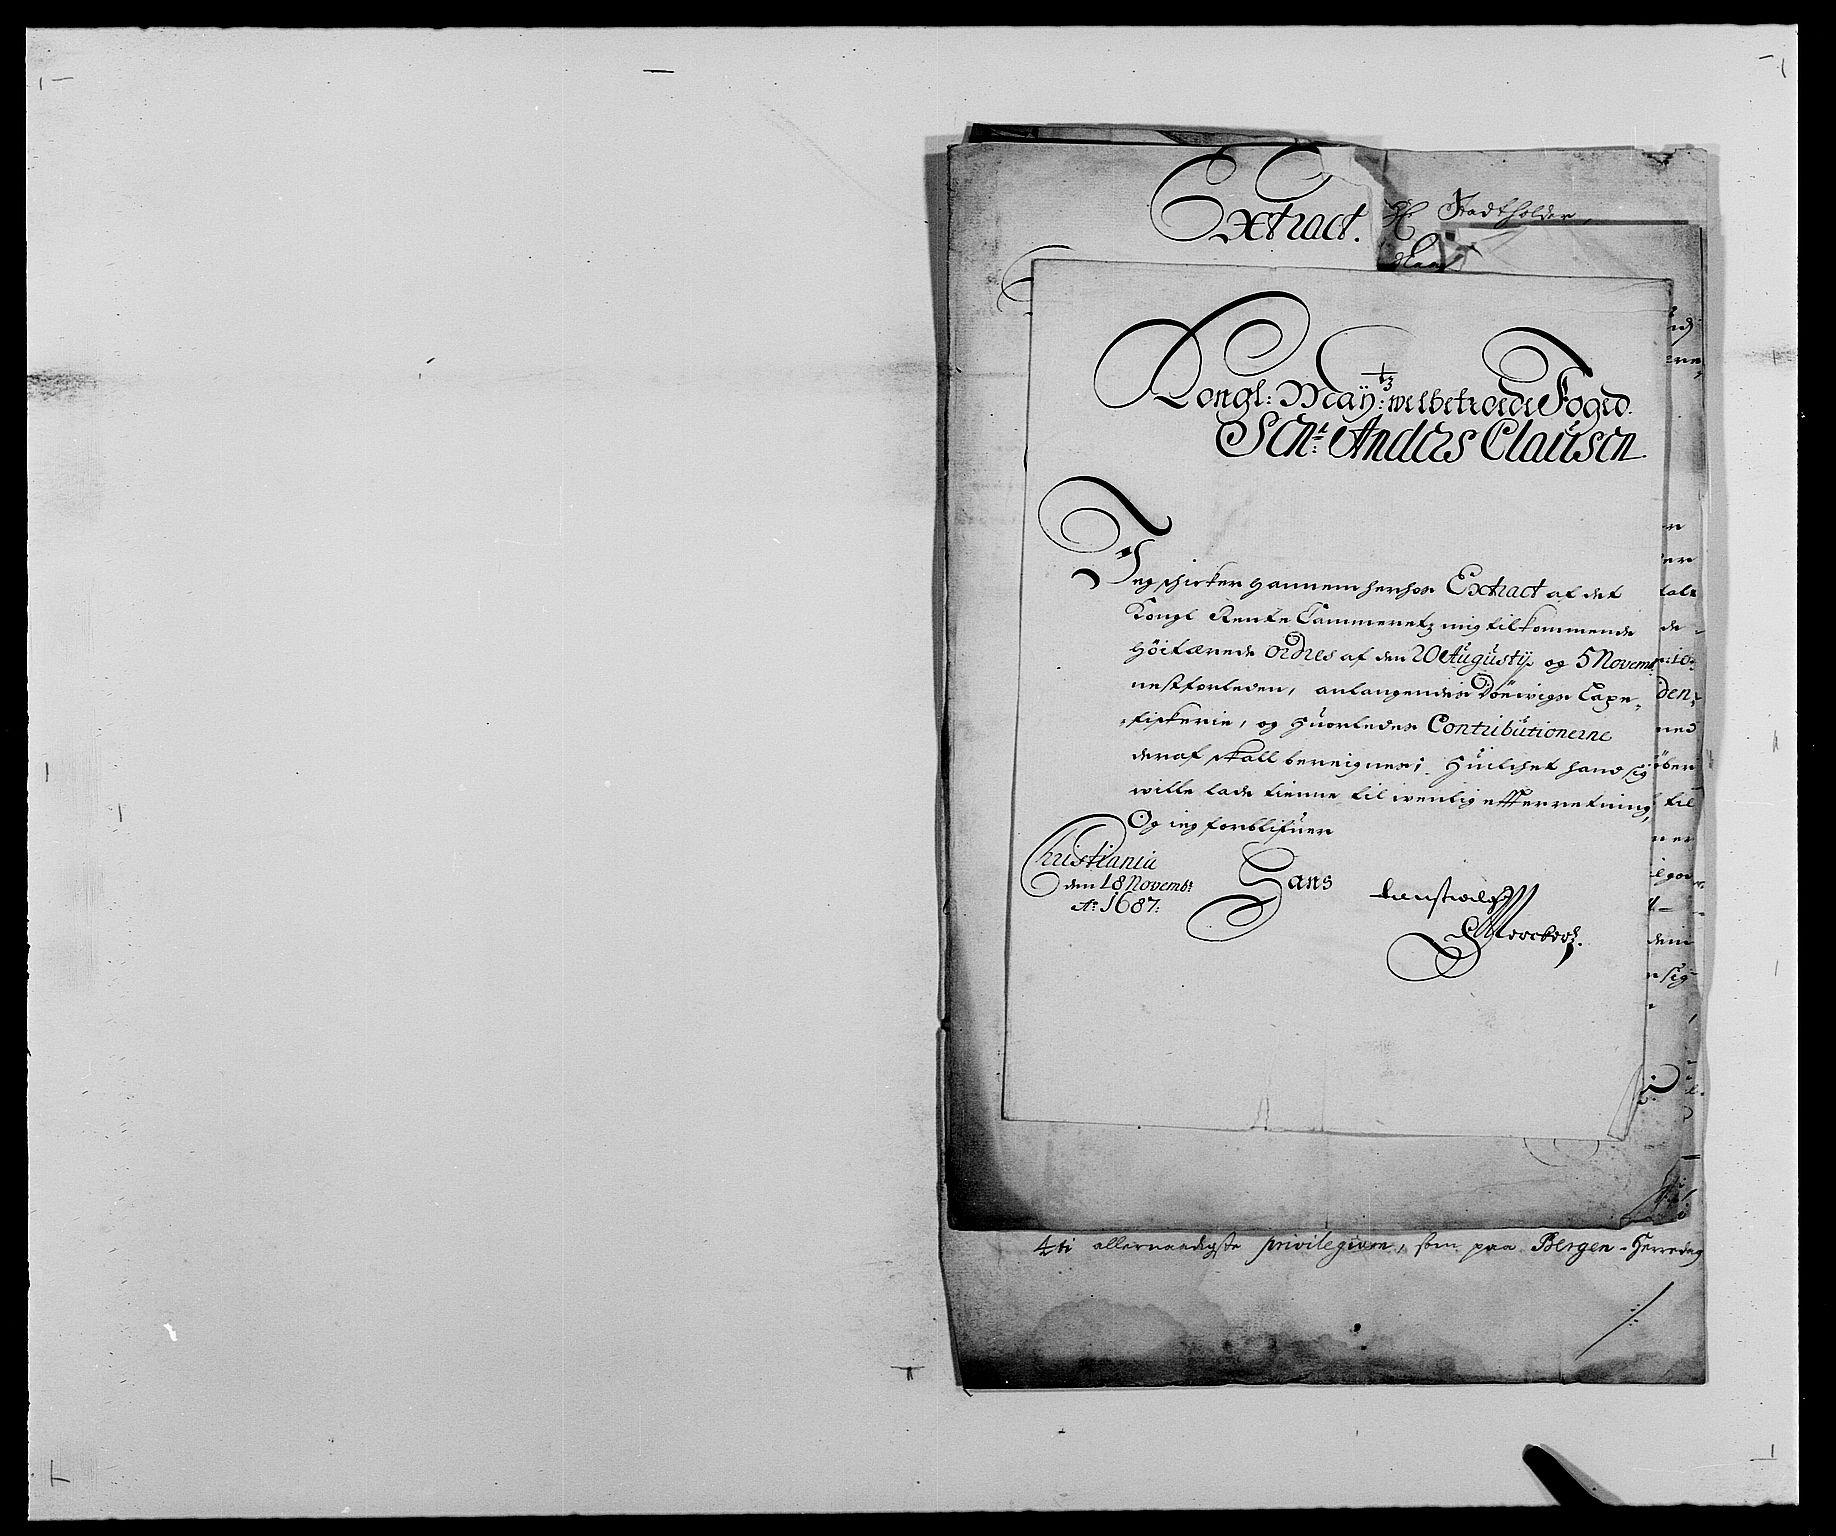 RA, Rentekammeret inntil 1814, Reviderte regnskaper, Fogderegnskap, R25/L1679: Fogderegnskap Buskerud, 1687-1688, s. 238